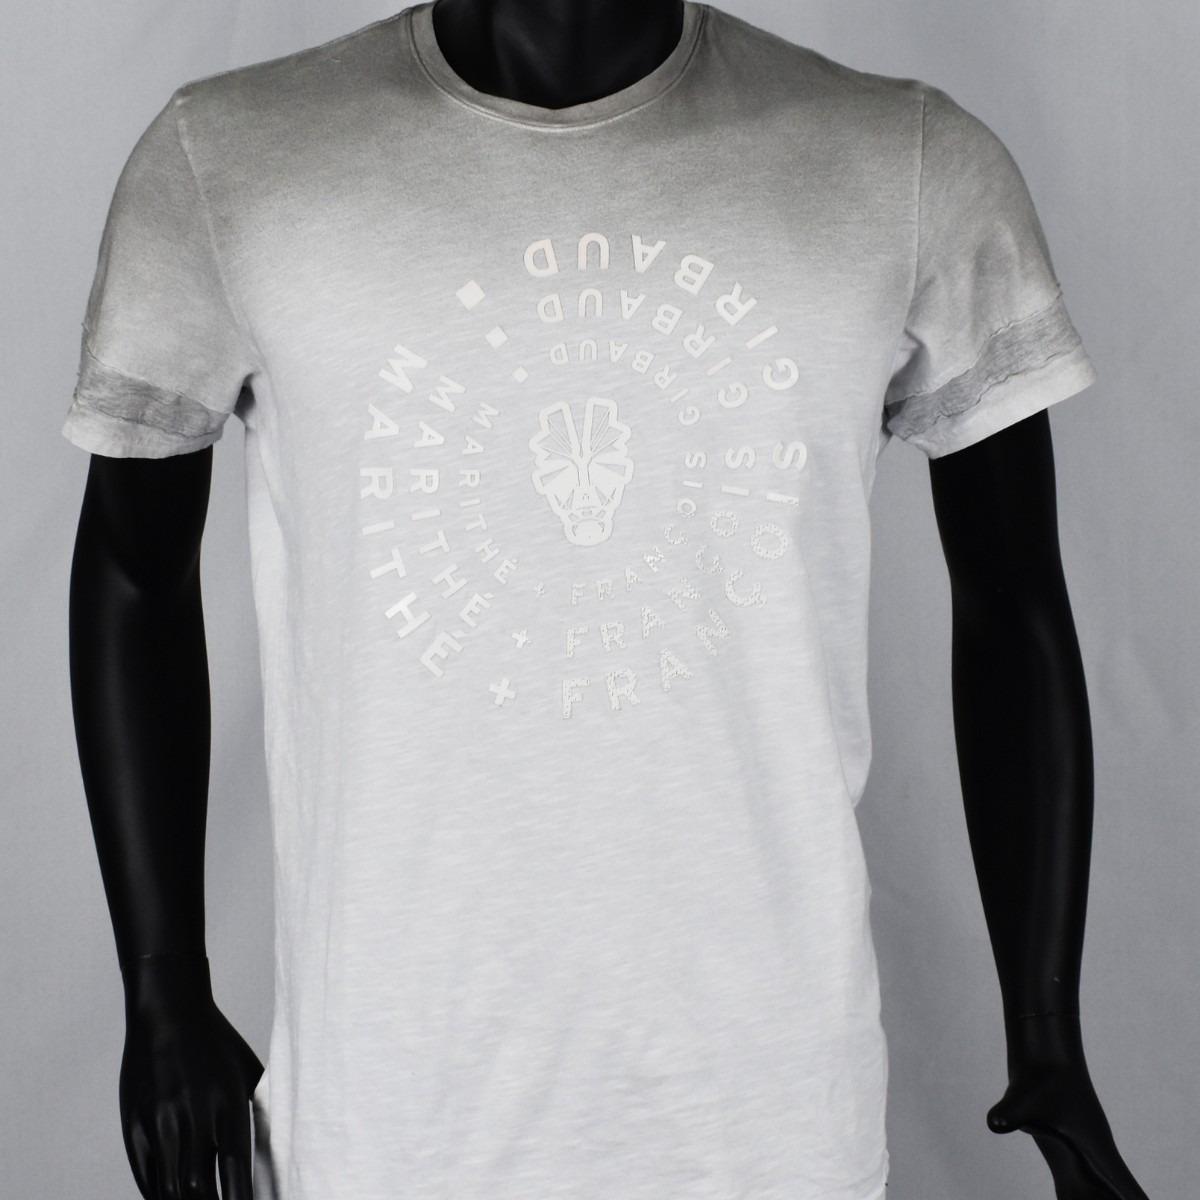 6dad211a6 Camiseta M/c De Marithe + Francois Girbaud Para Hombre - U$S 39,99 ...